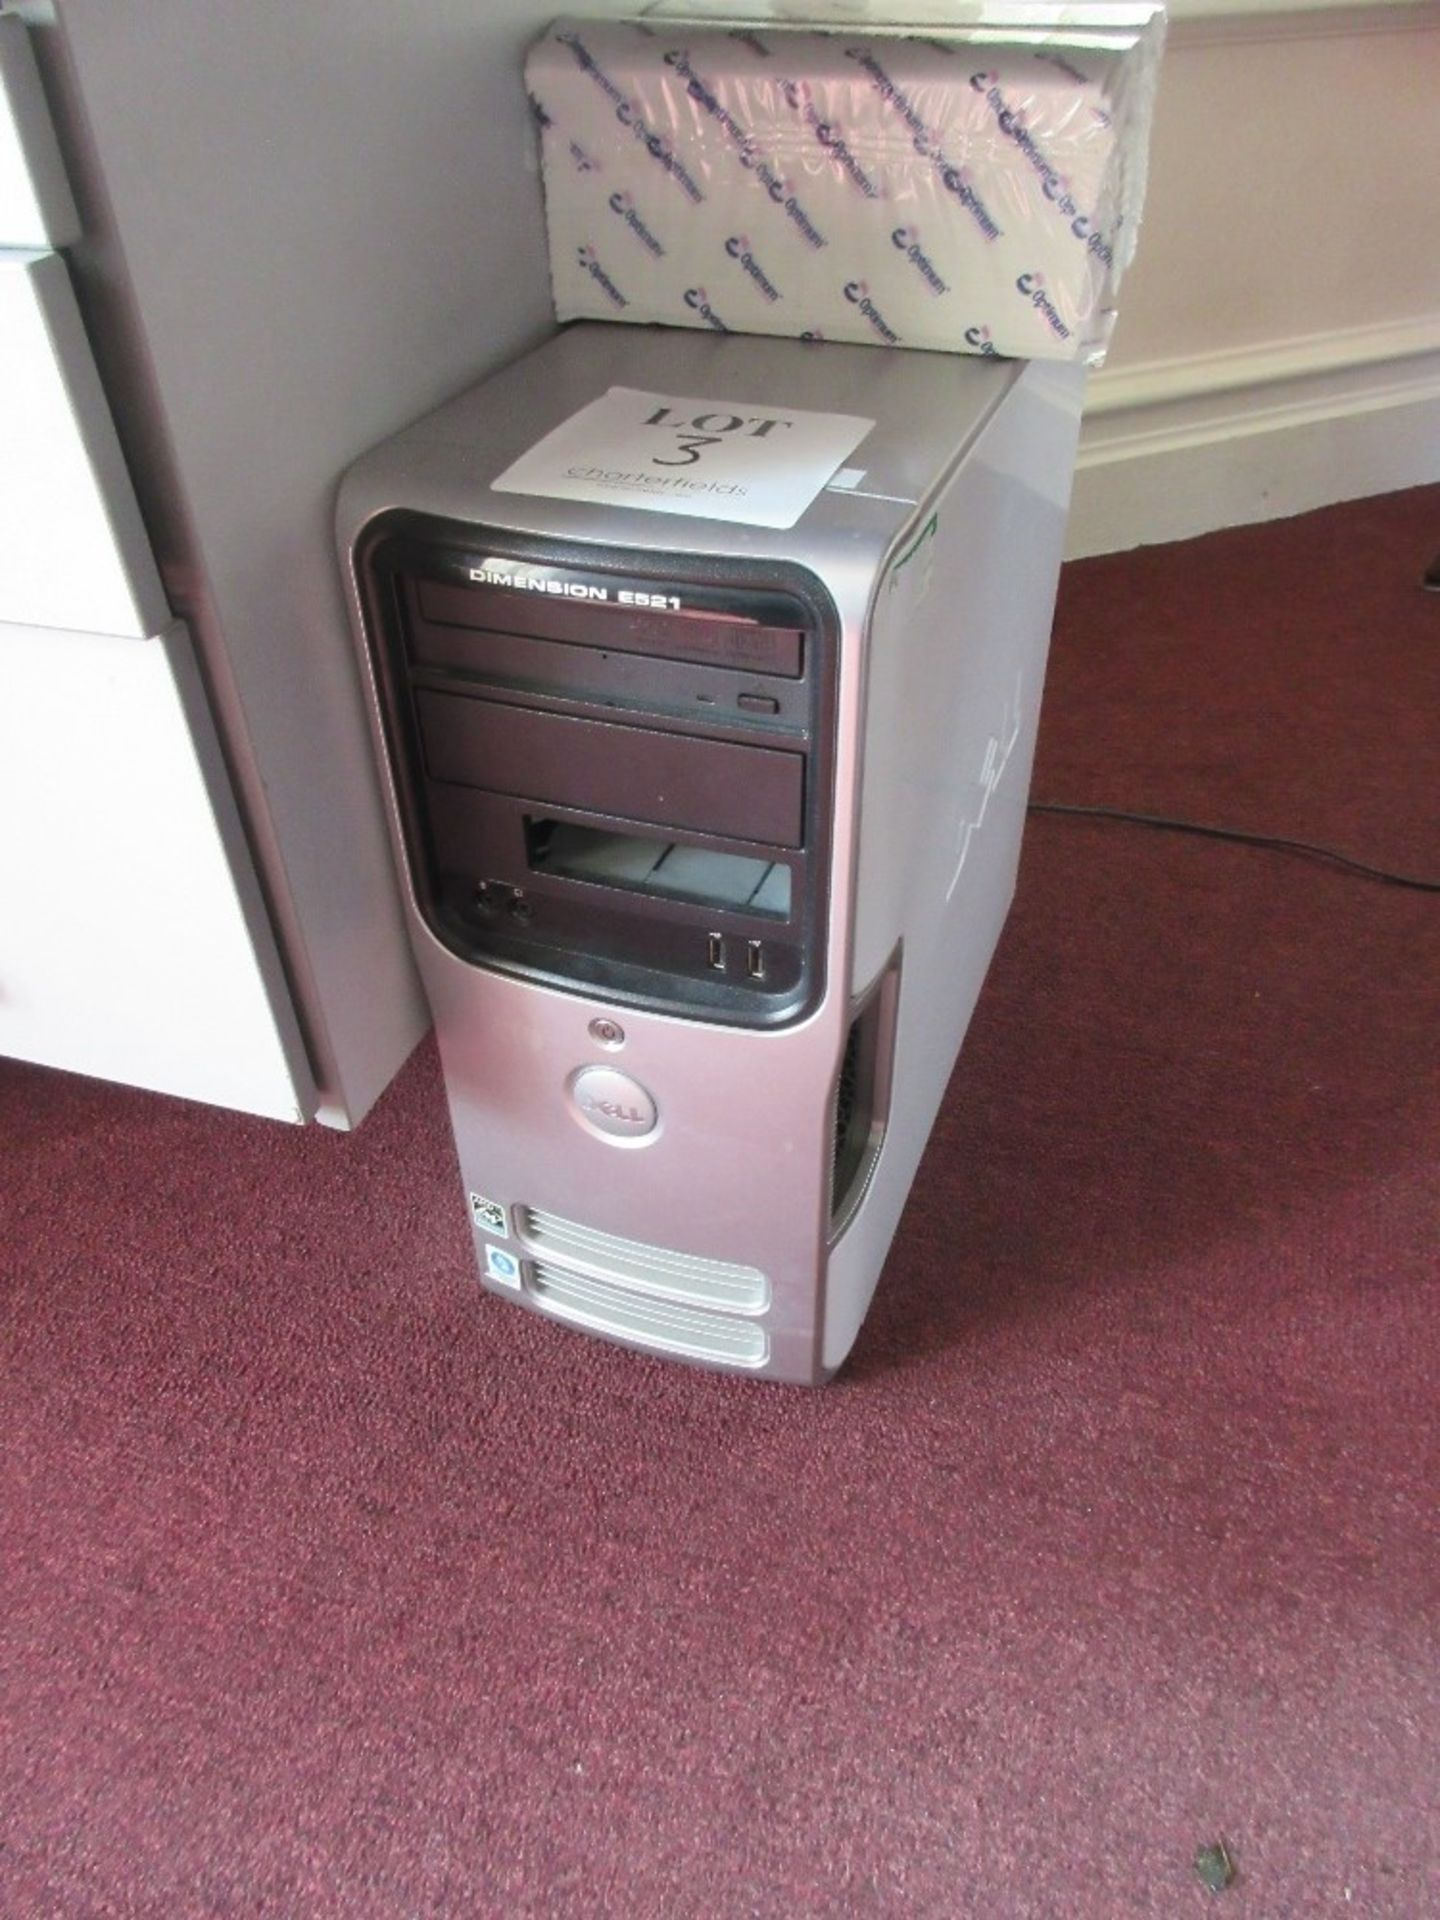 Lot 3 - Dell Dimension E521 PC tower, AMD ATHLON, 4GB Memory, 320GB Hard Drive (all data and software erased